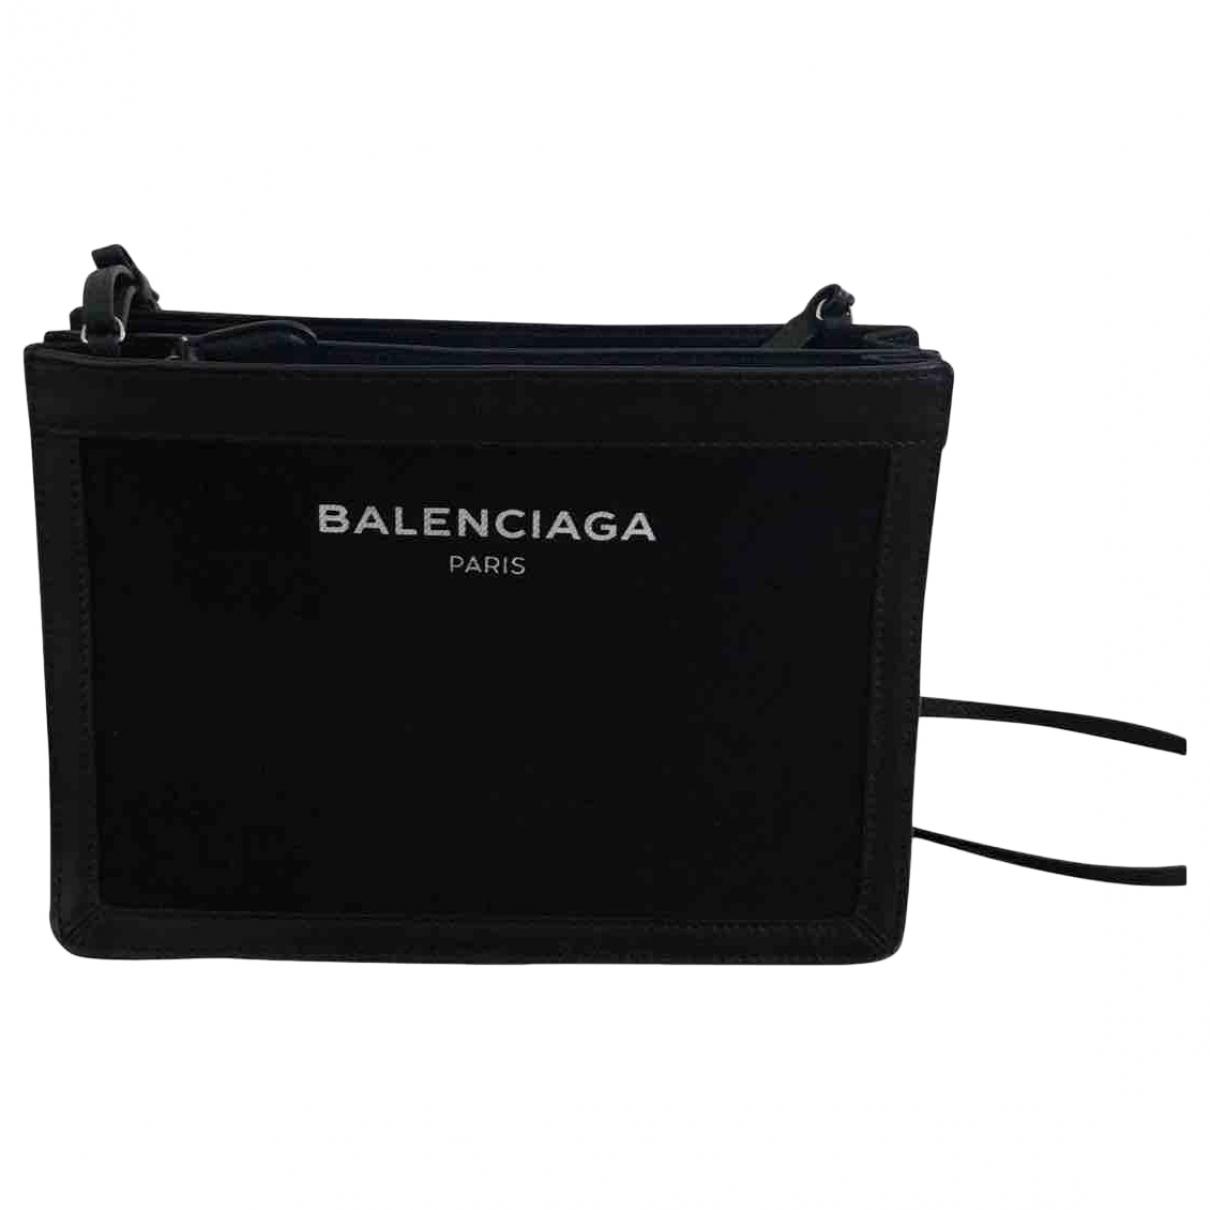 Balenciaga - Sac a main   pour femme en denim - noir